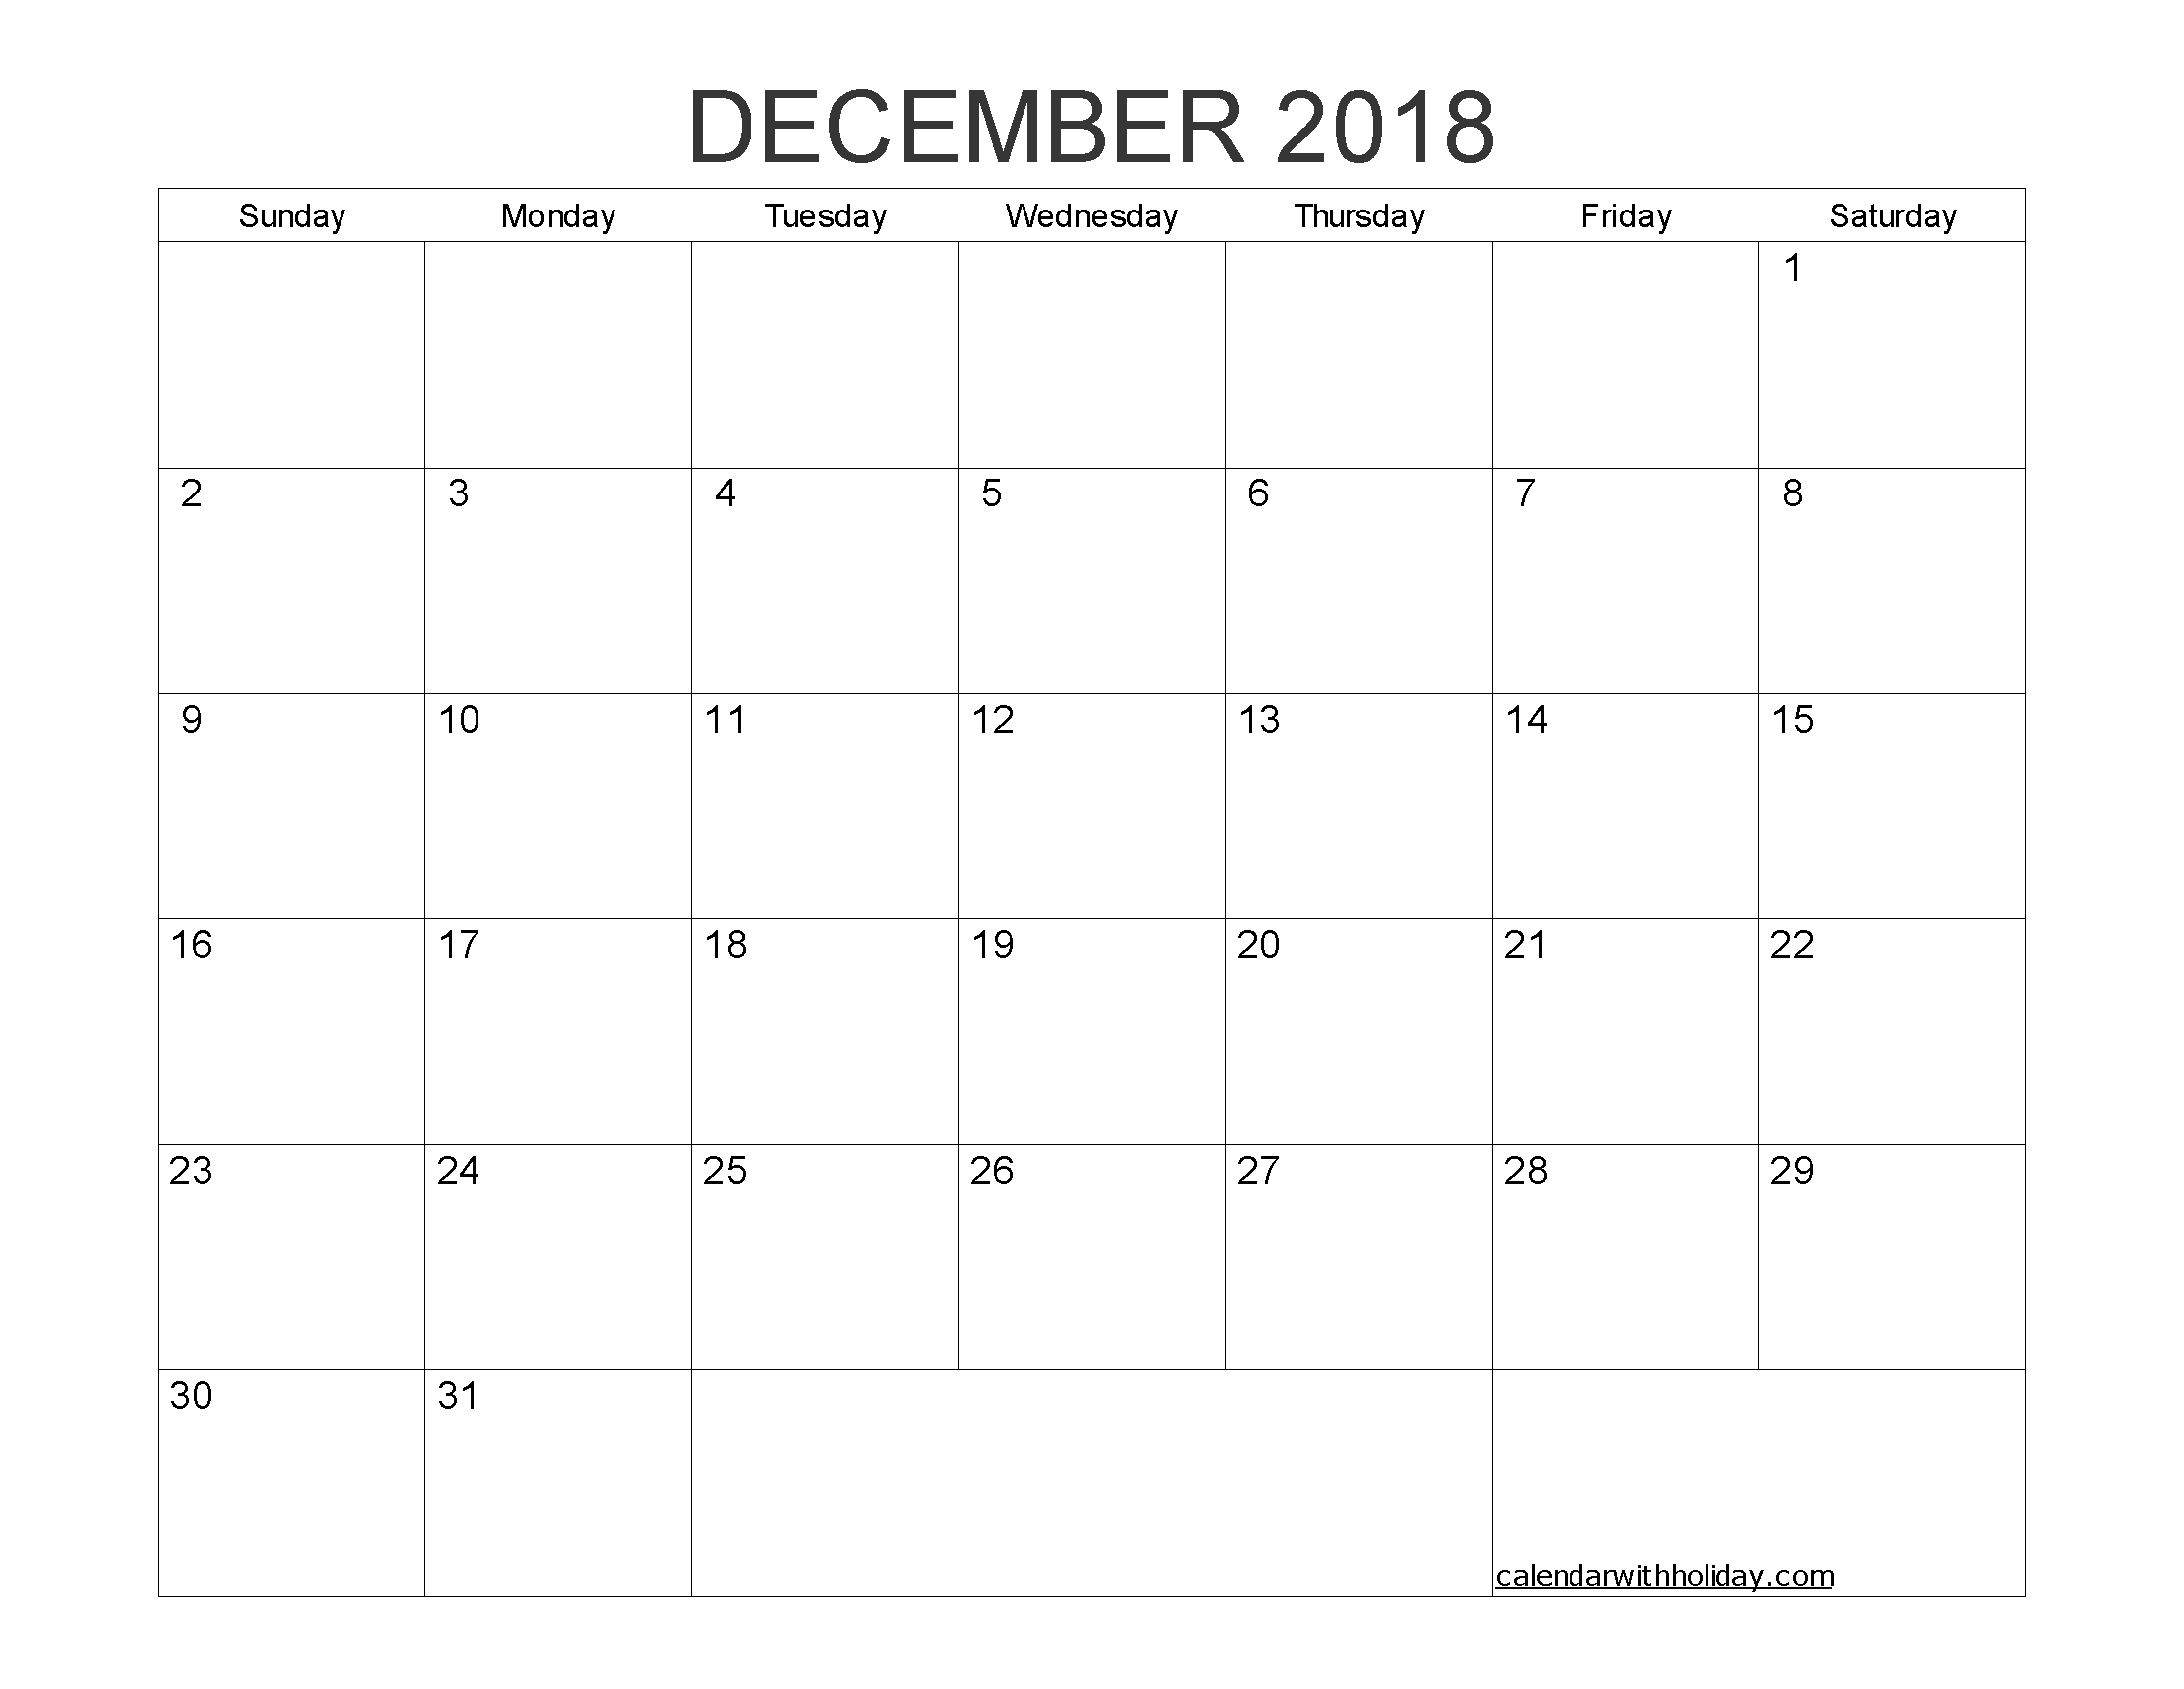 Free Printable Calendar December 2018 as PDF and Image